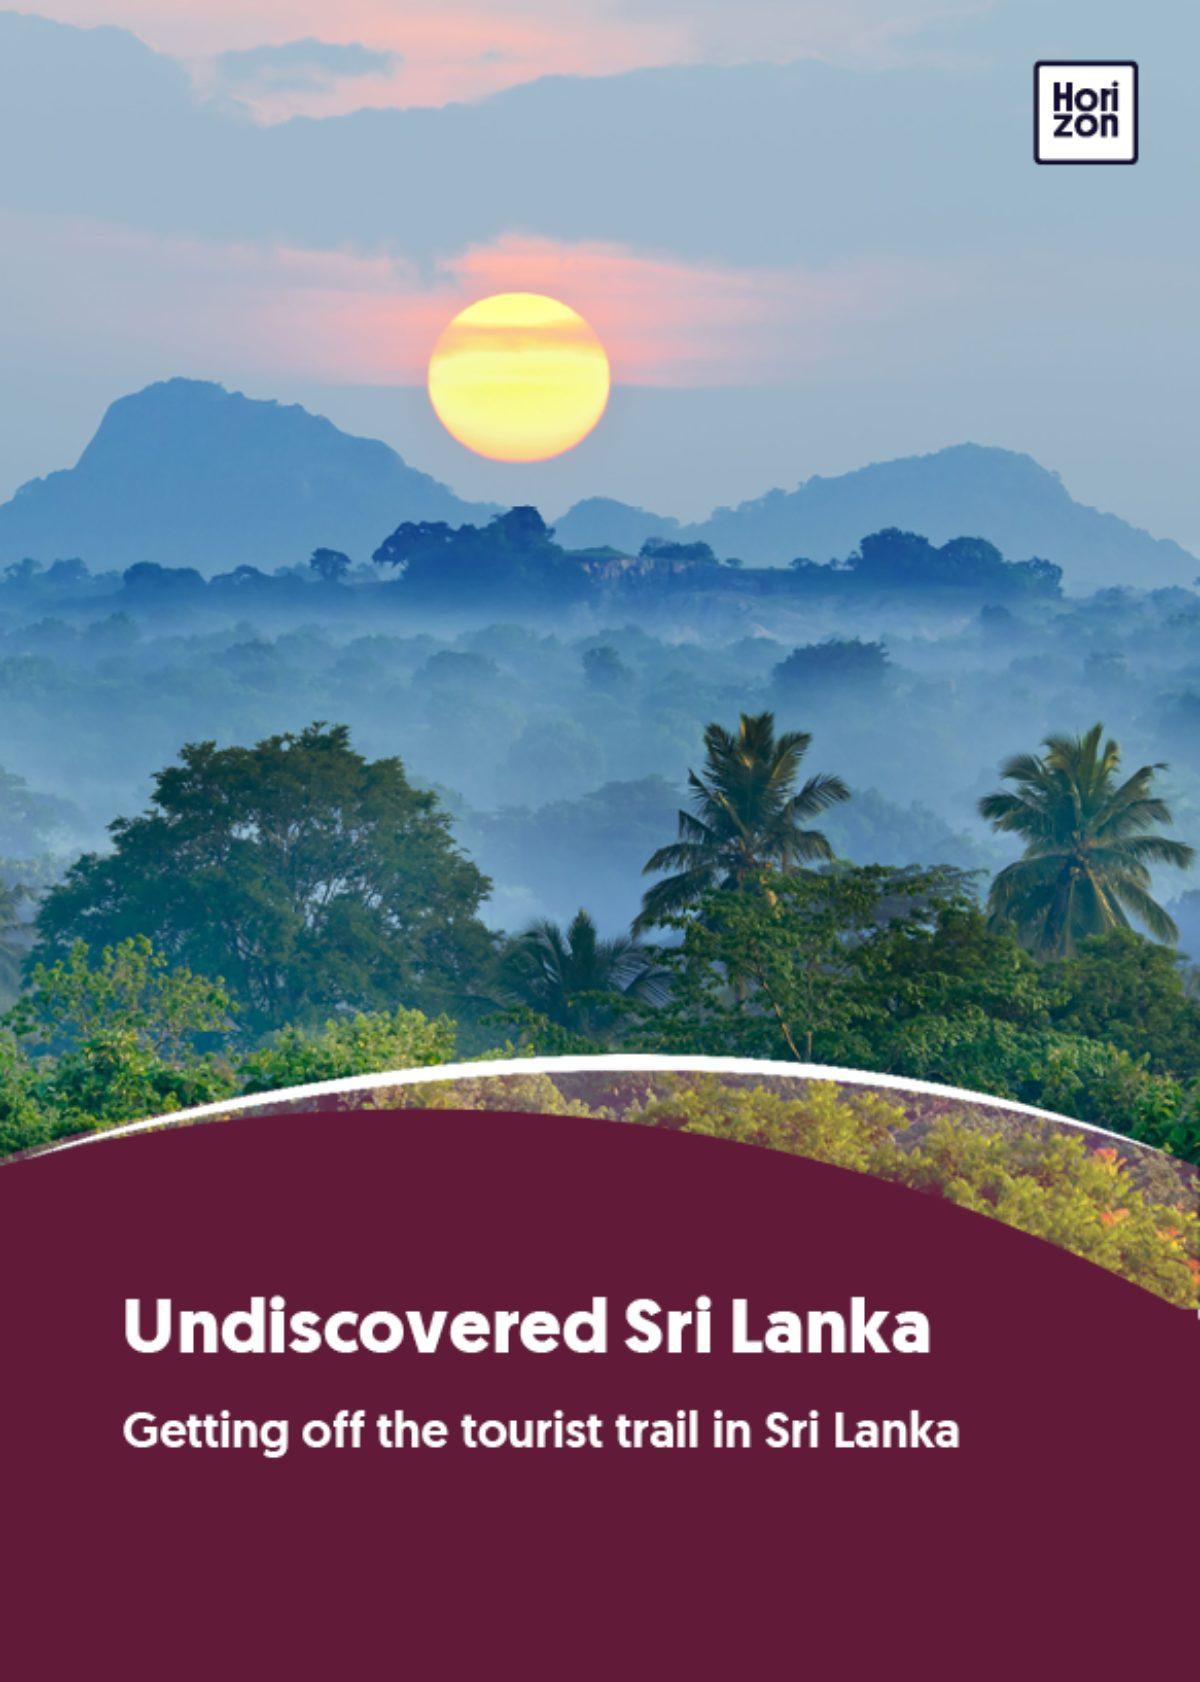 Undiscovered Sri Lanka